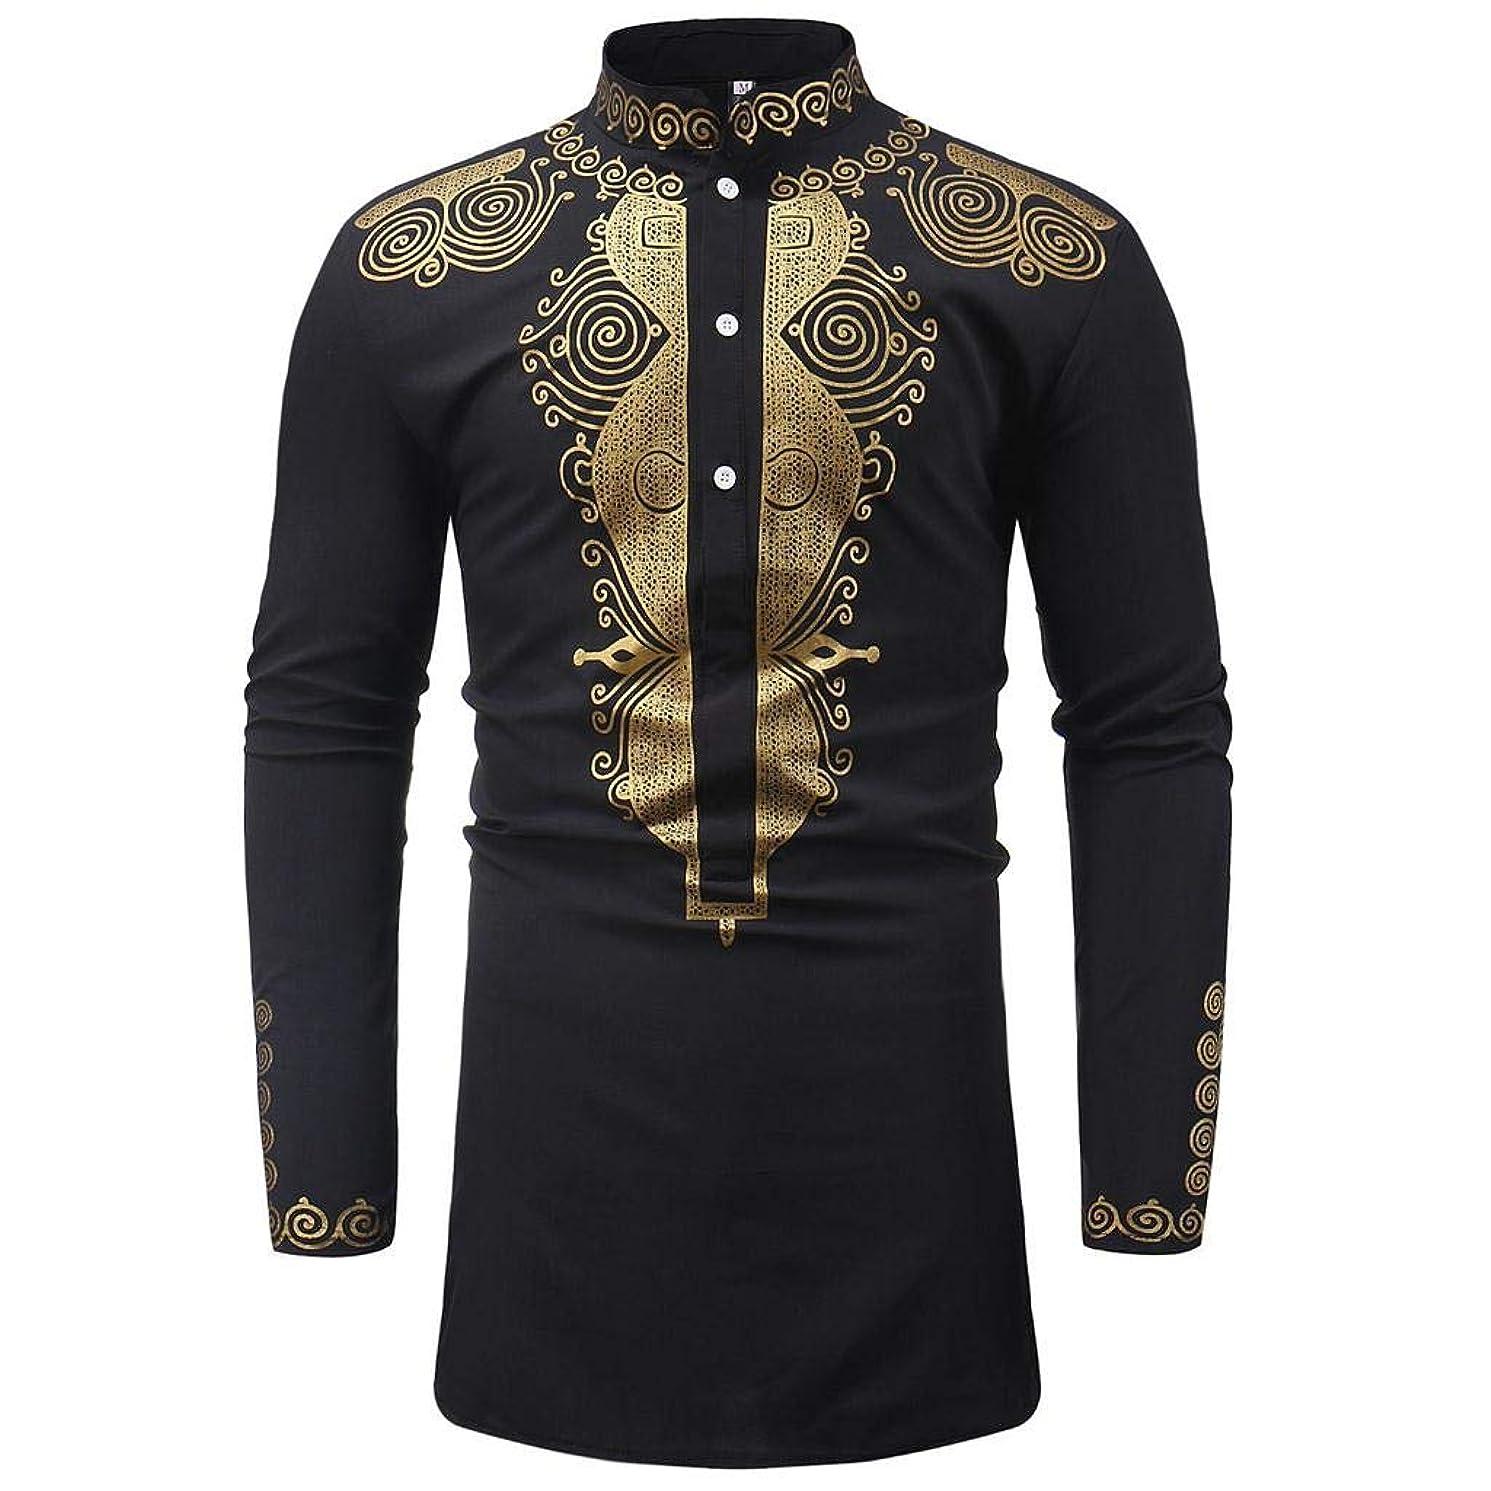 Luxfan Mens African Clothing Tribal Dashiki Long Shirt Traditional Ethnic Slim Fit Henley Shirt